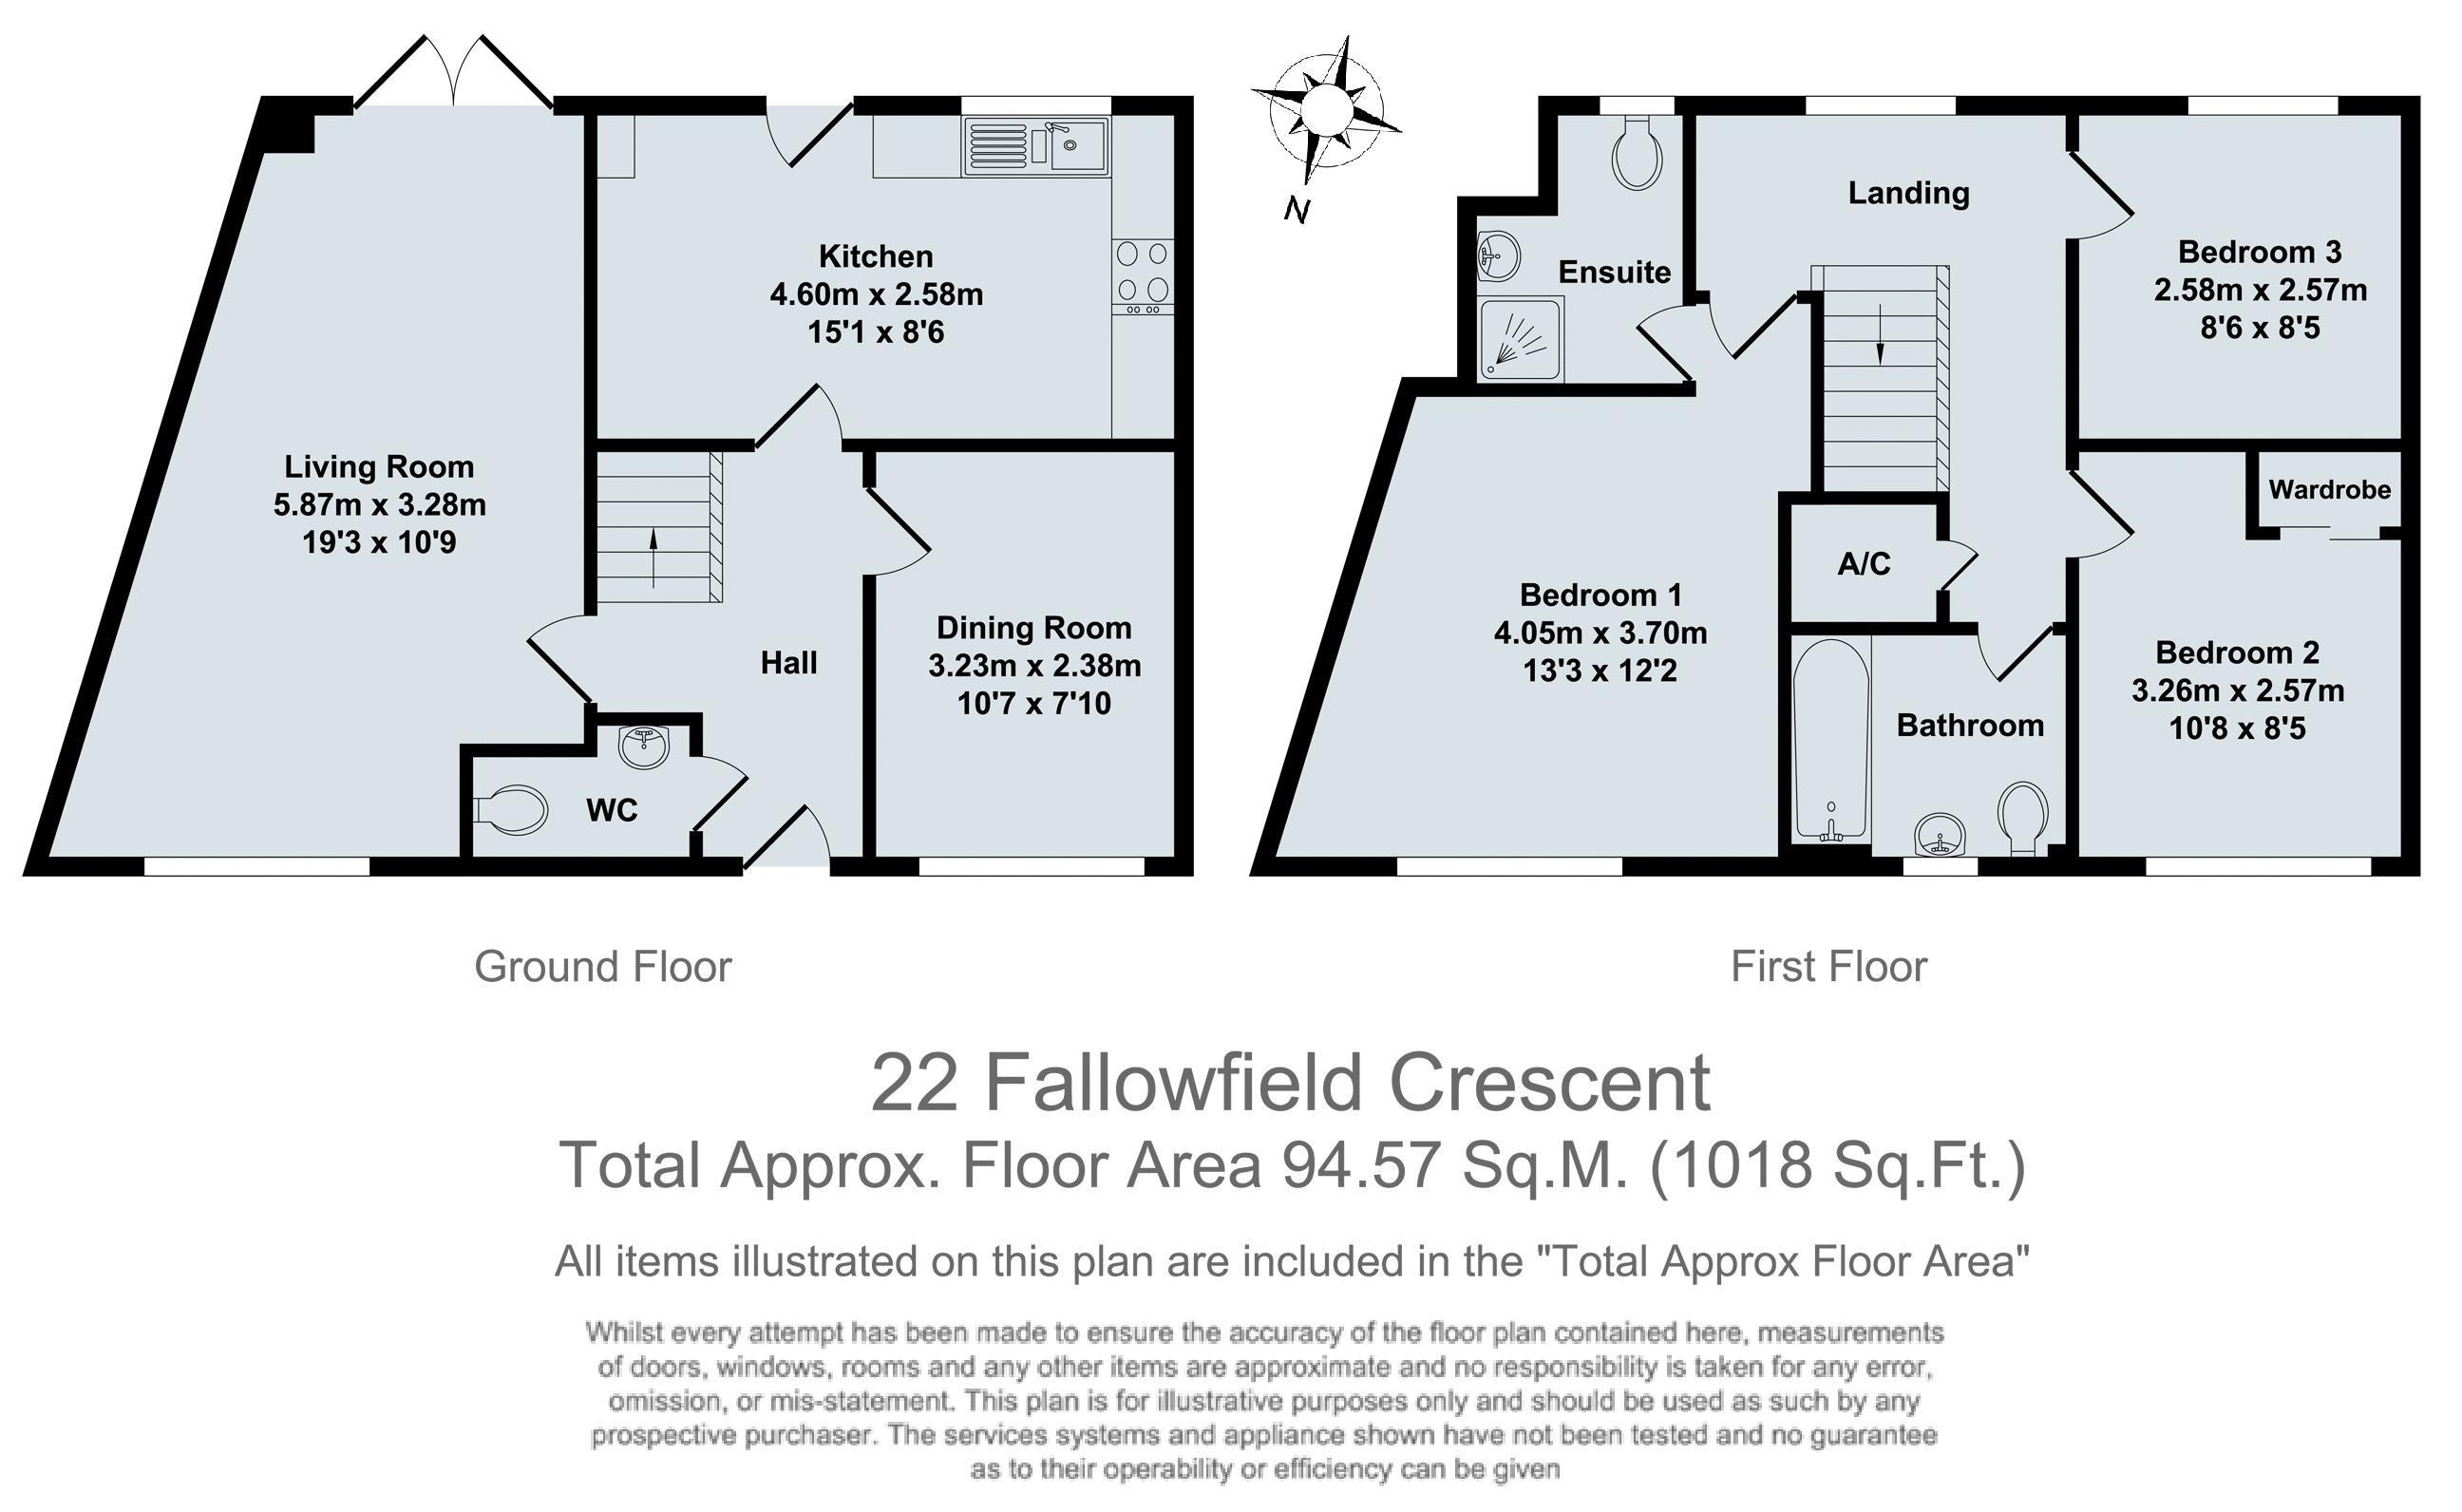 Fallowfield Crescent